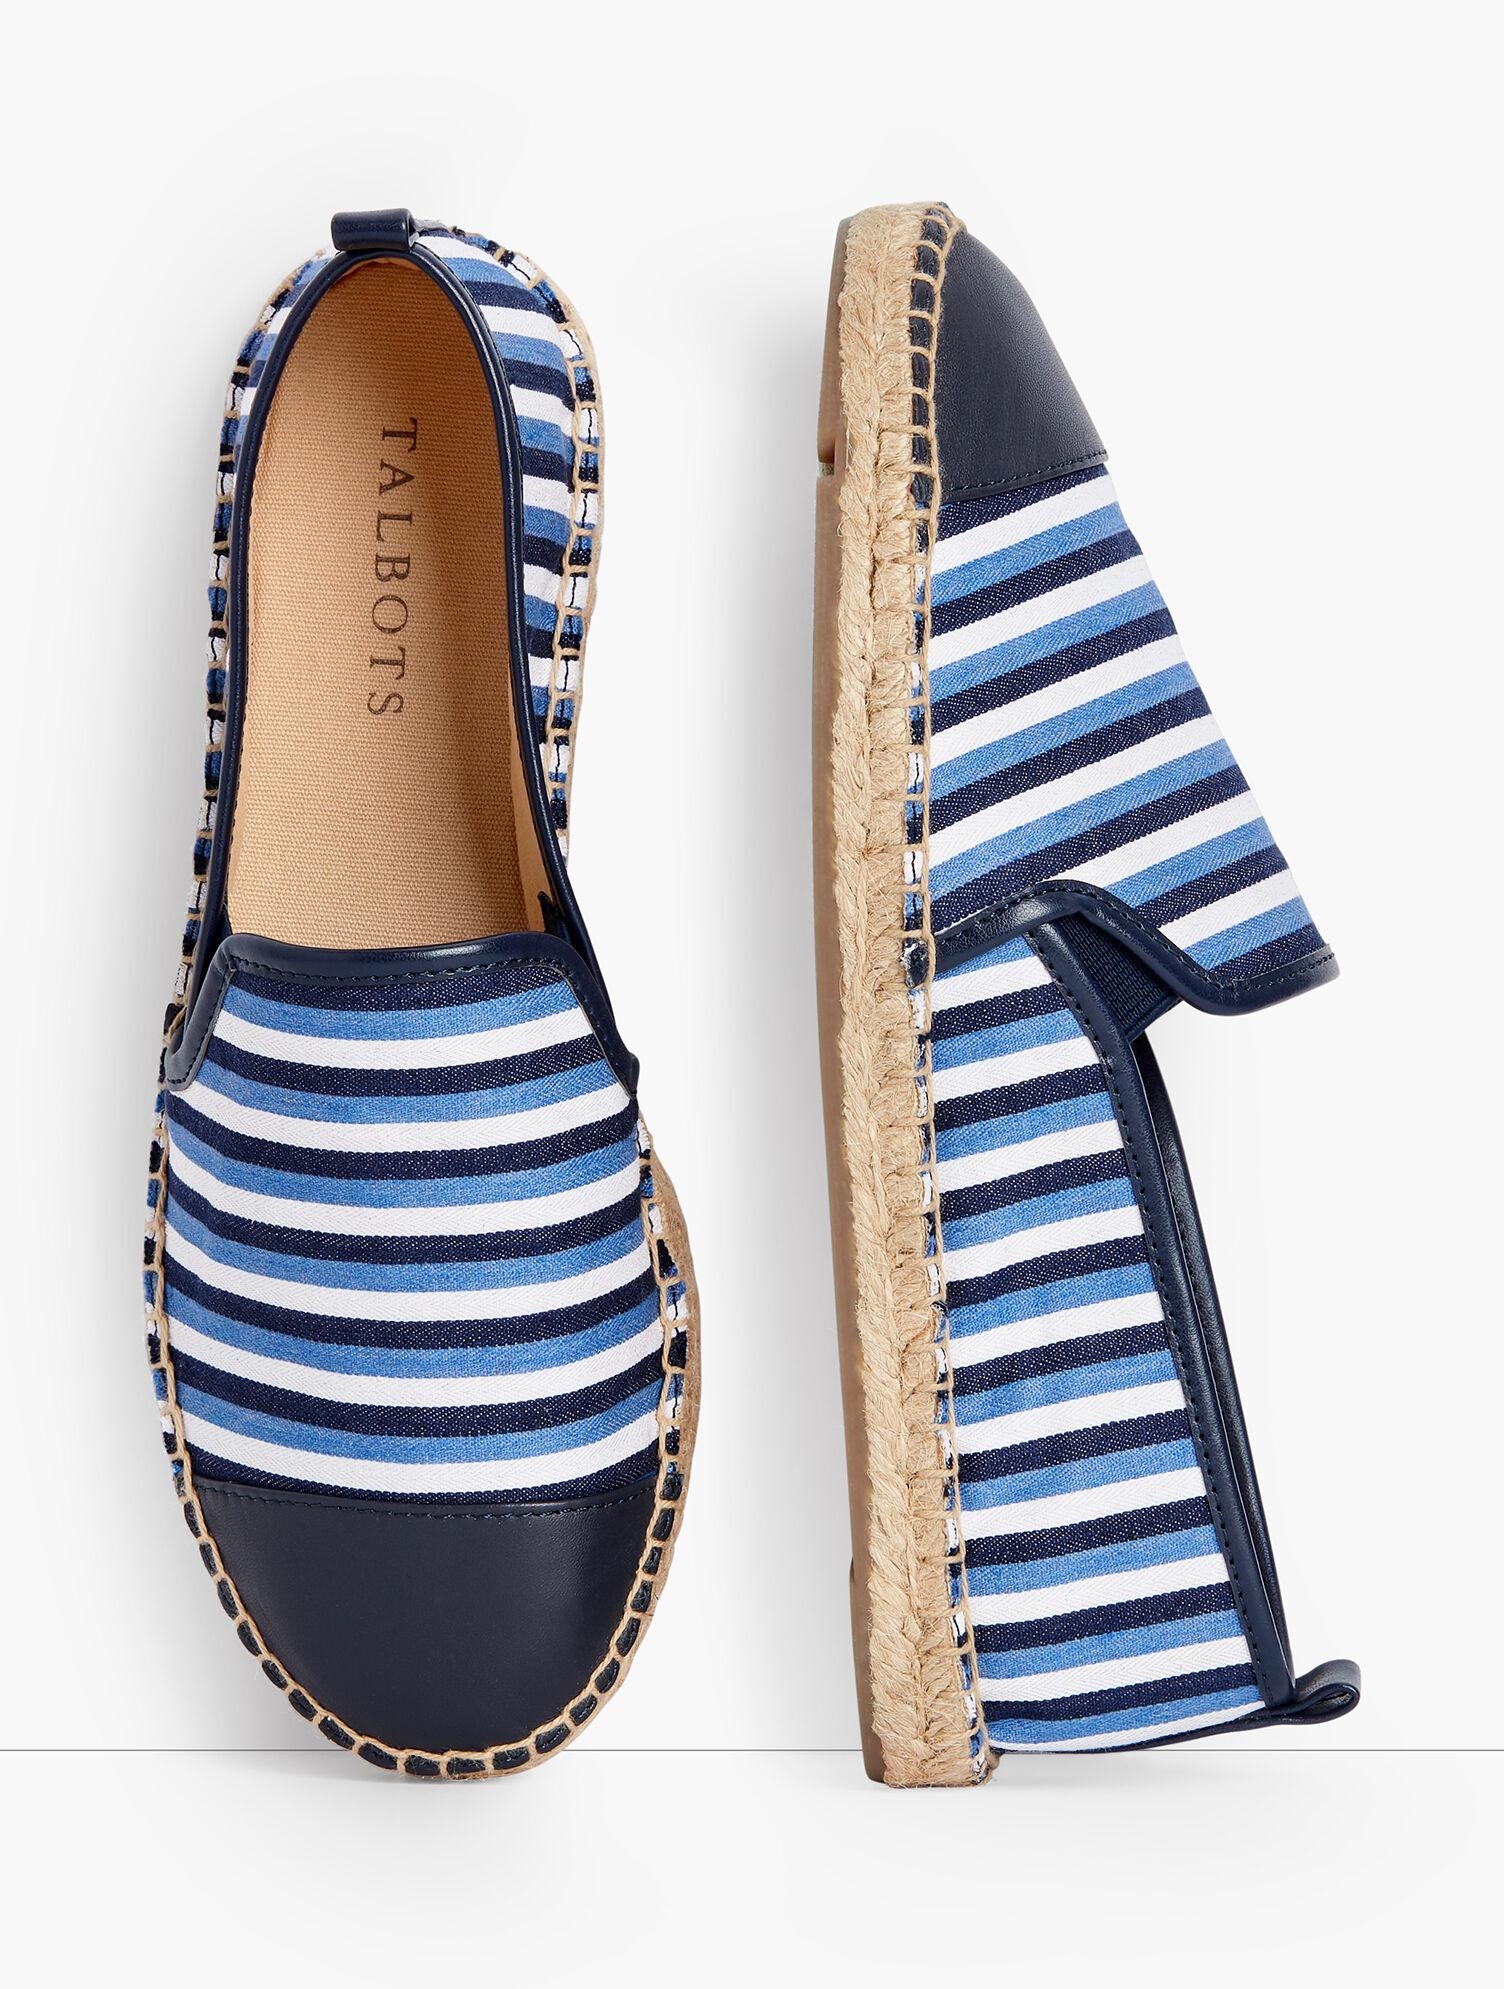 Lovers Classic Espadrilles Heel Sandals Casual Stripe Women Shoes